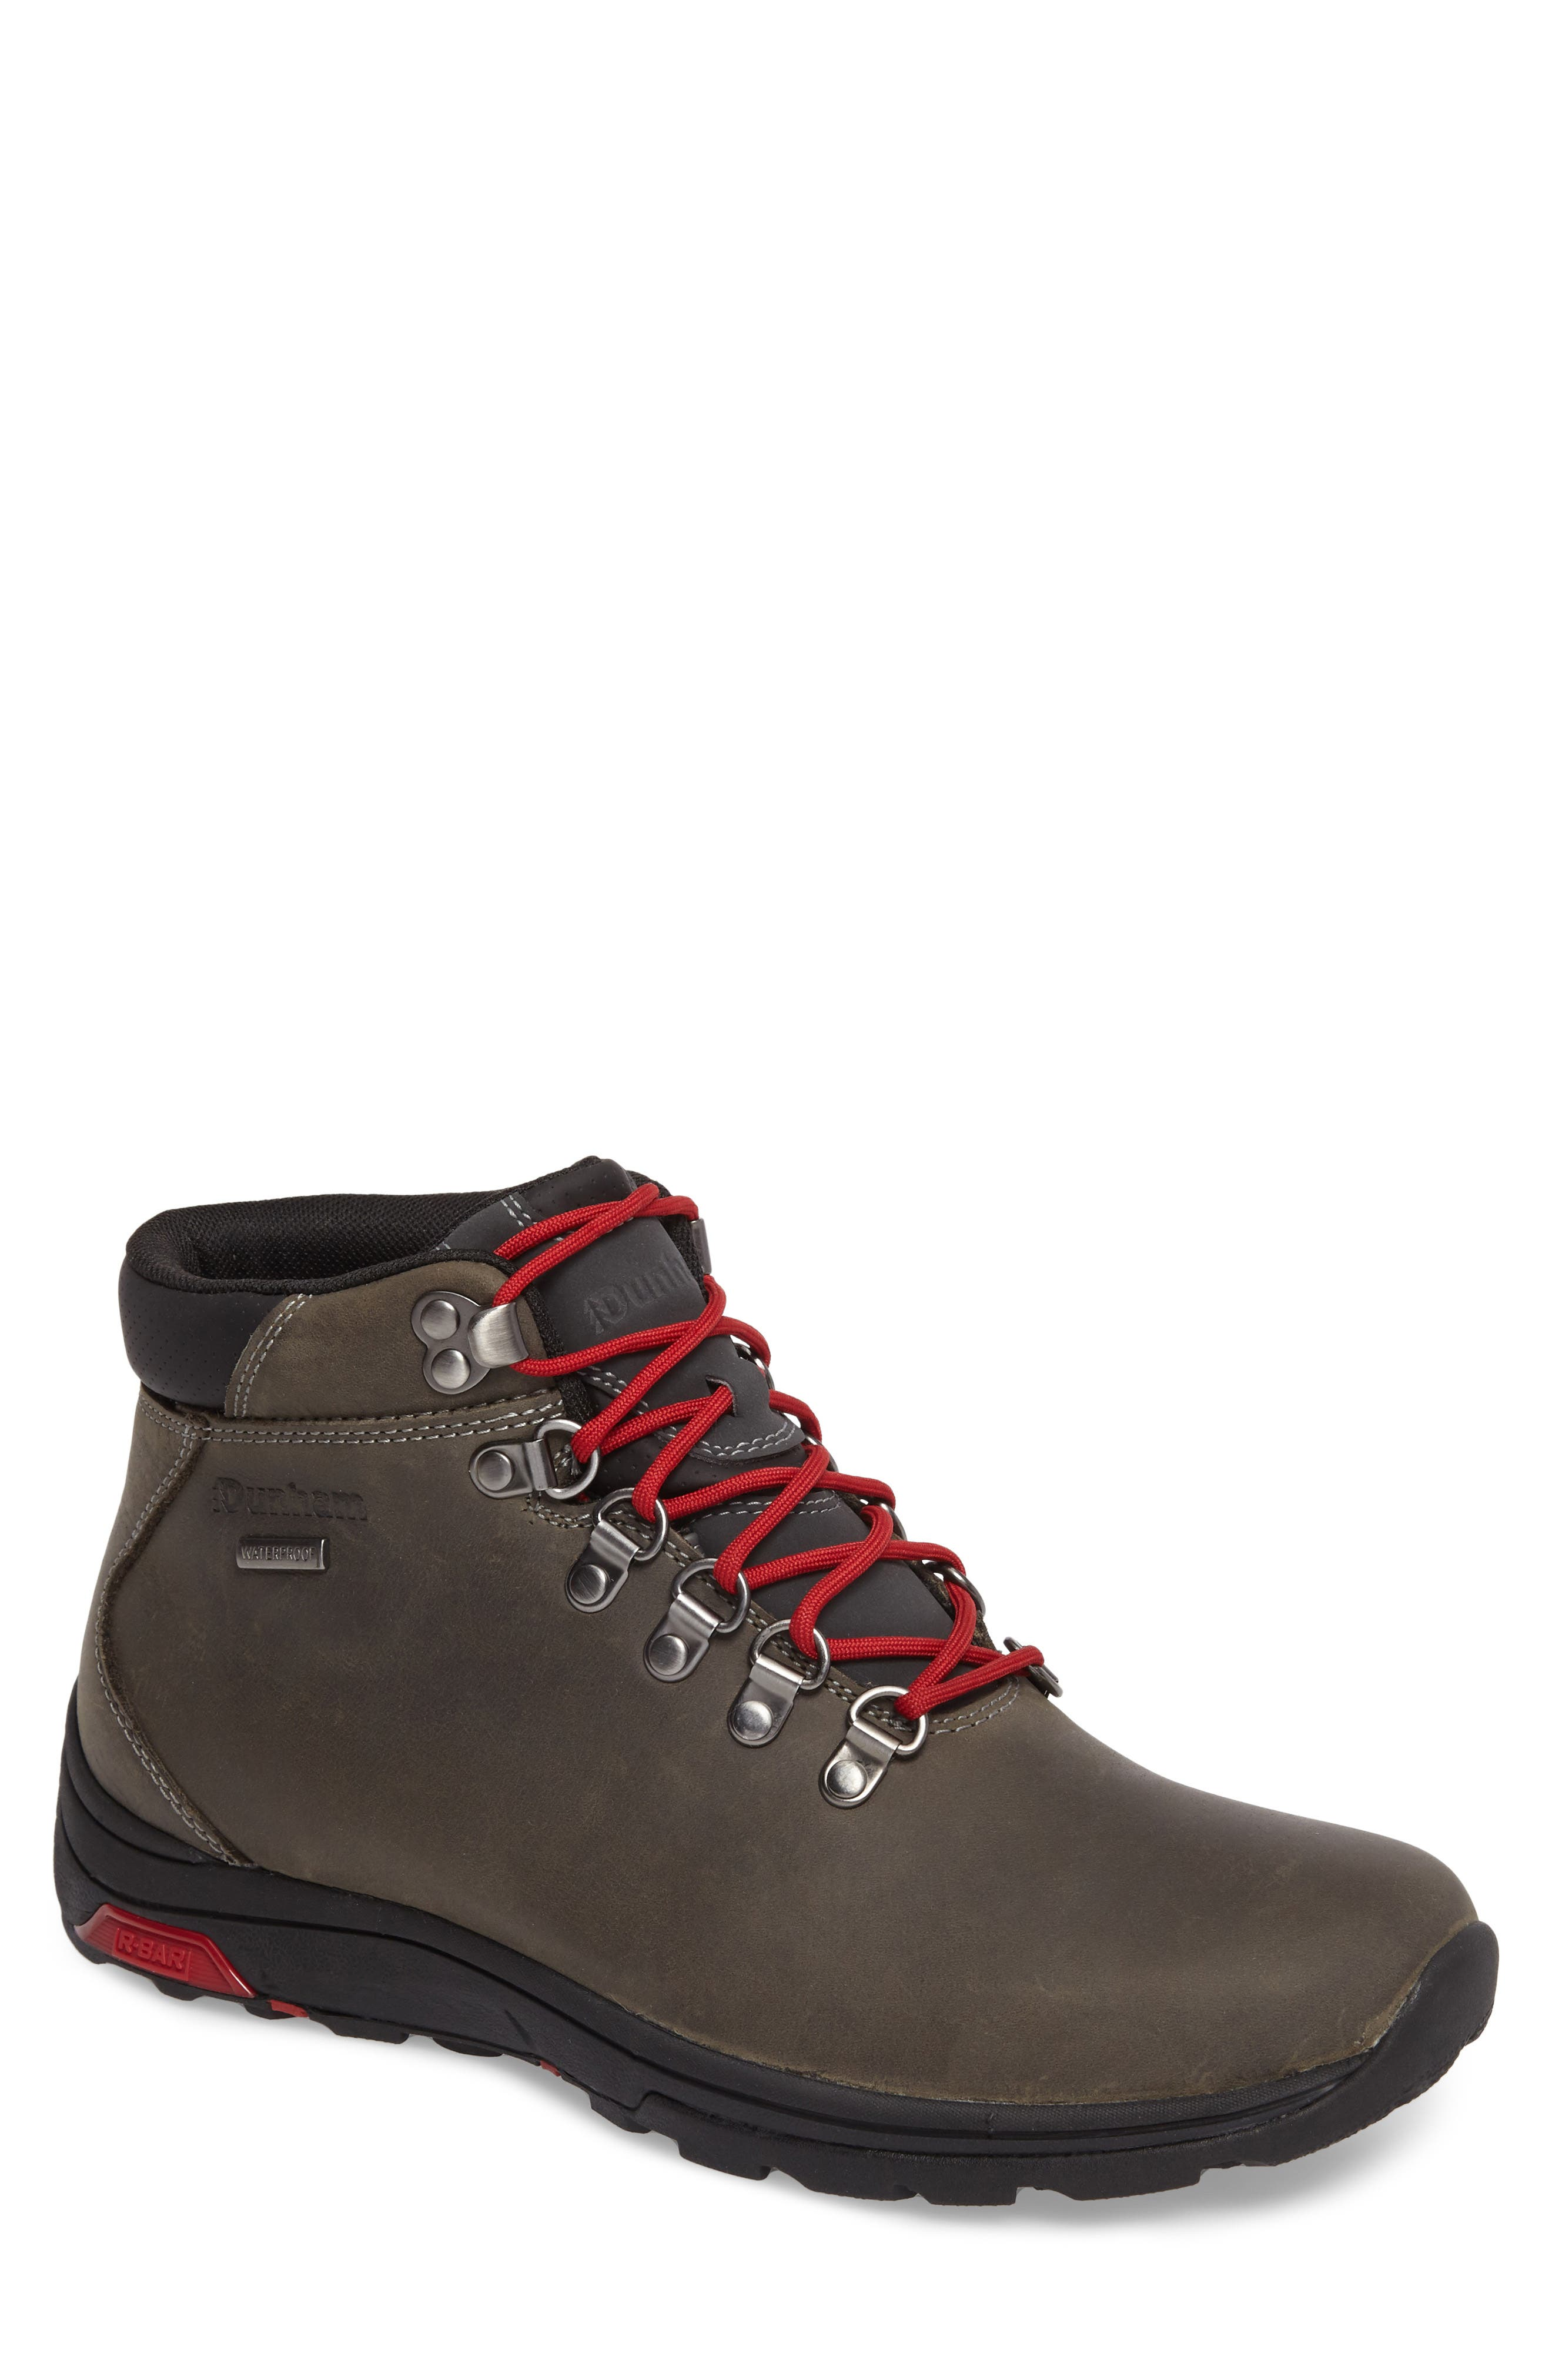 Trukka Waterproof Boot,                         Main,                         color, DARK GREY